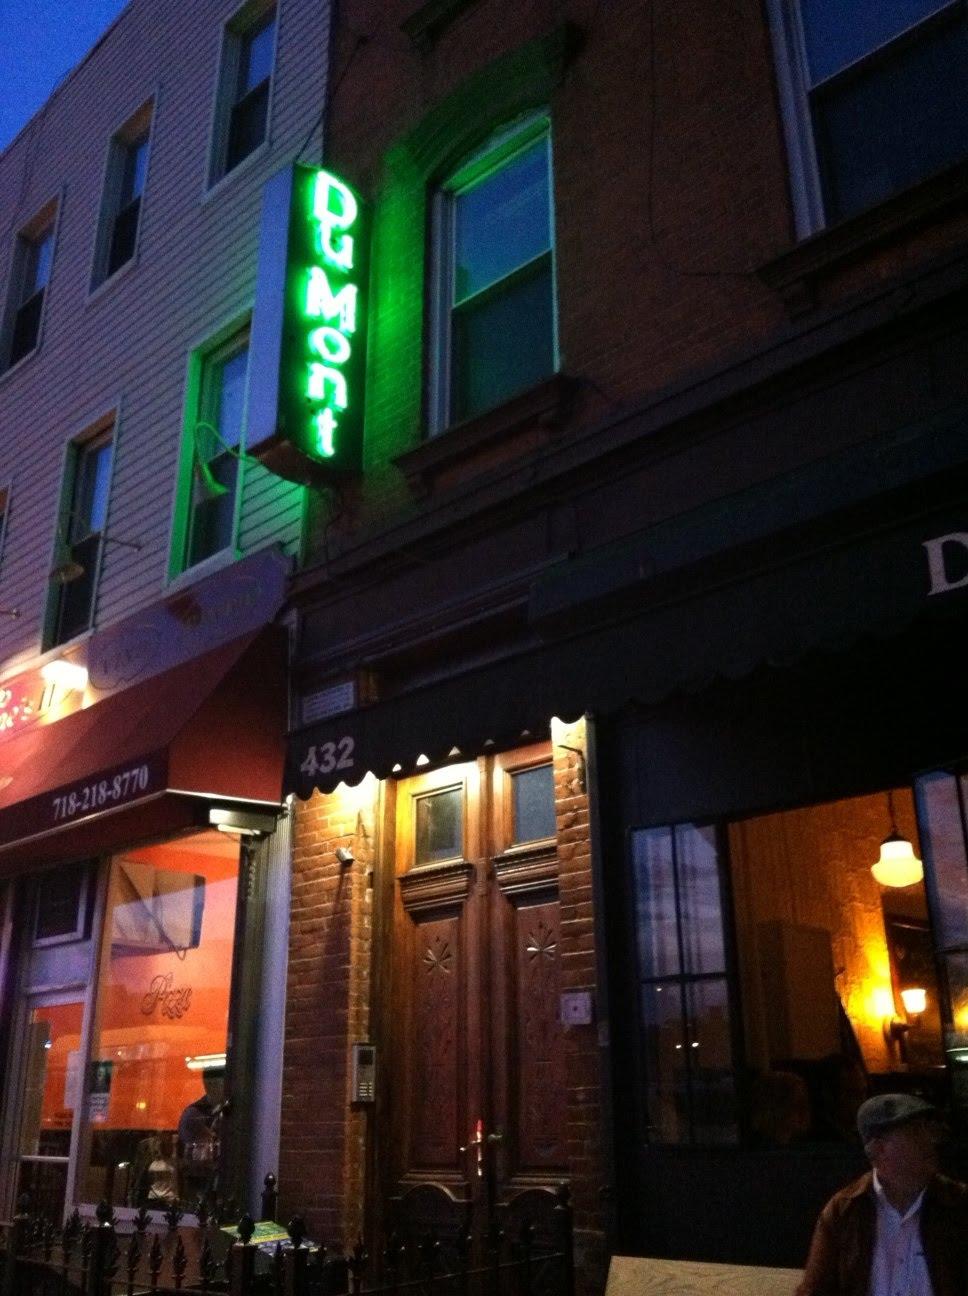 Restaurant review dumont brooklyn is cookin 39 for Domont restaurant